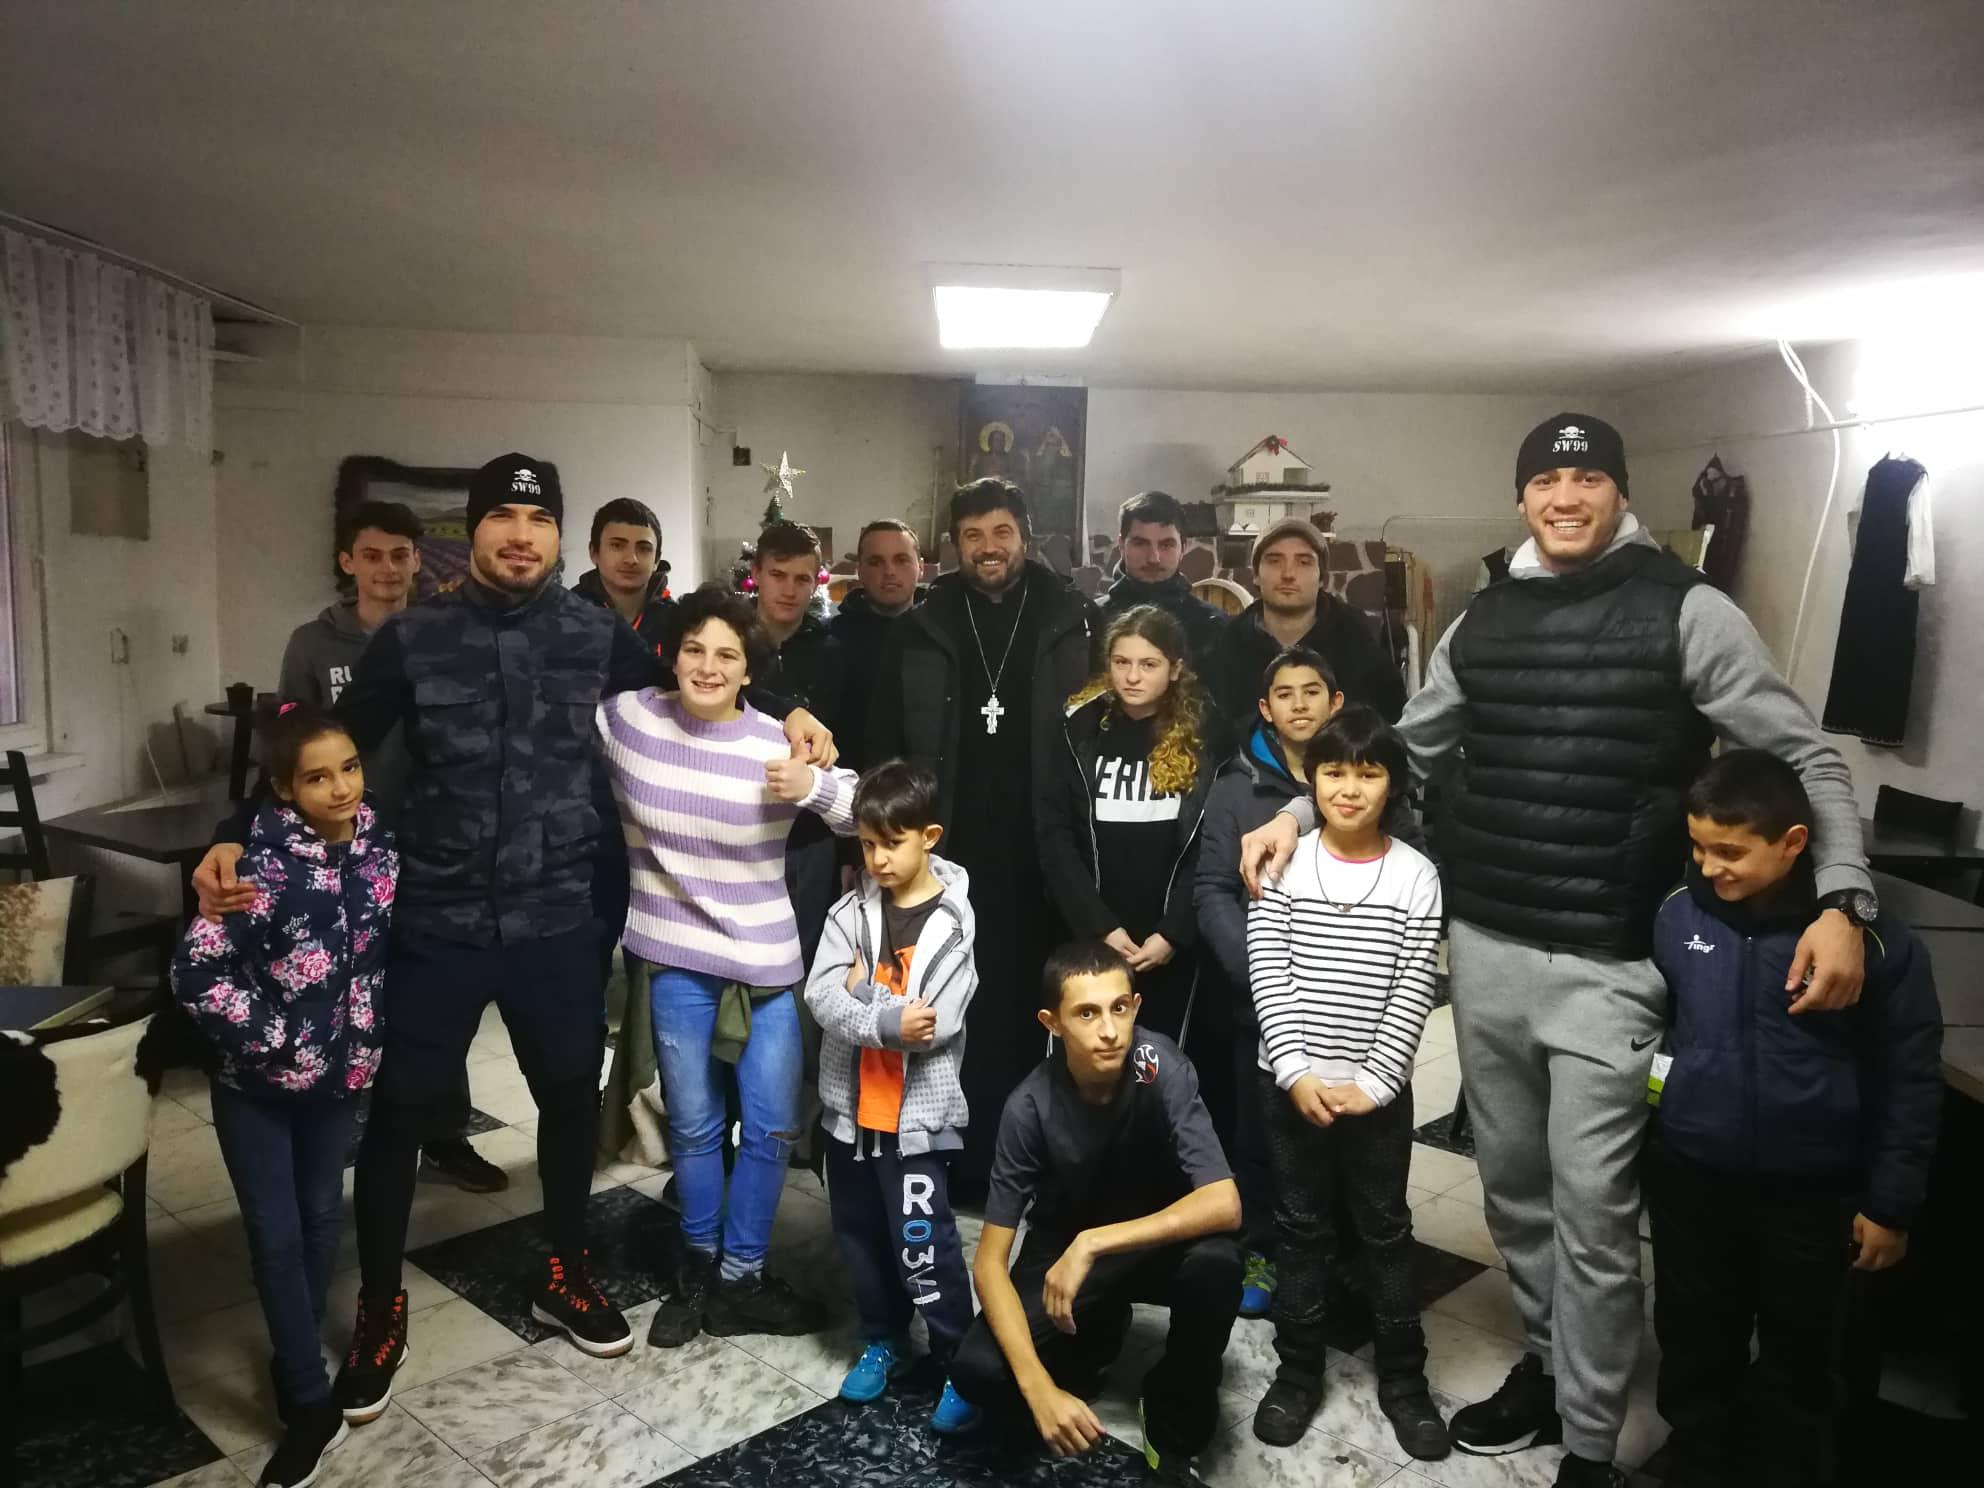 Даниел Илиев и Георги Валентинов зарадваха деца от дом за сираци (ВИДЕО)